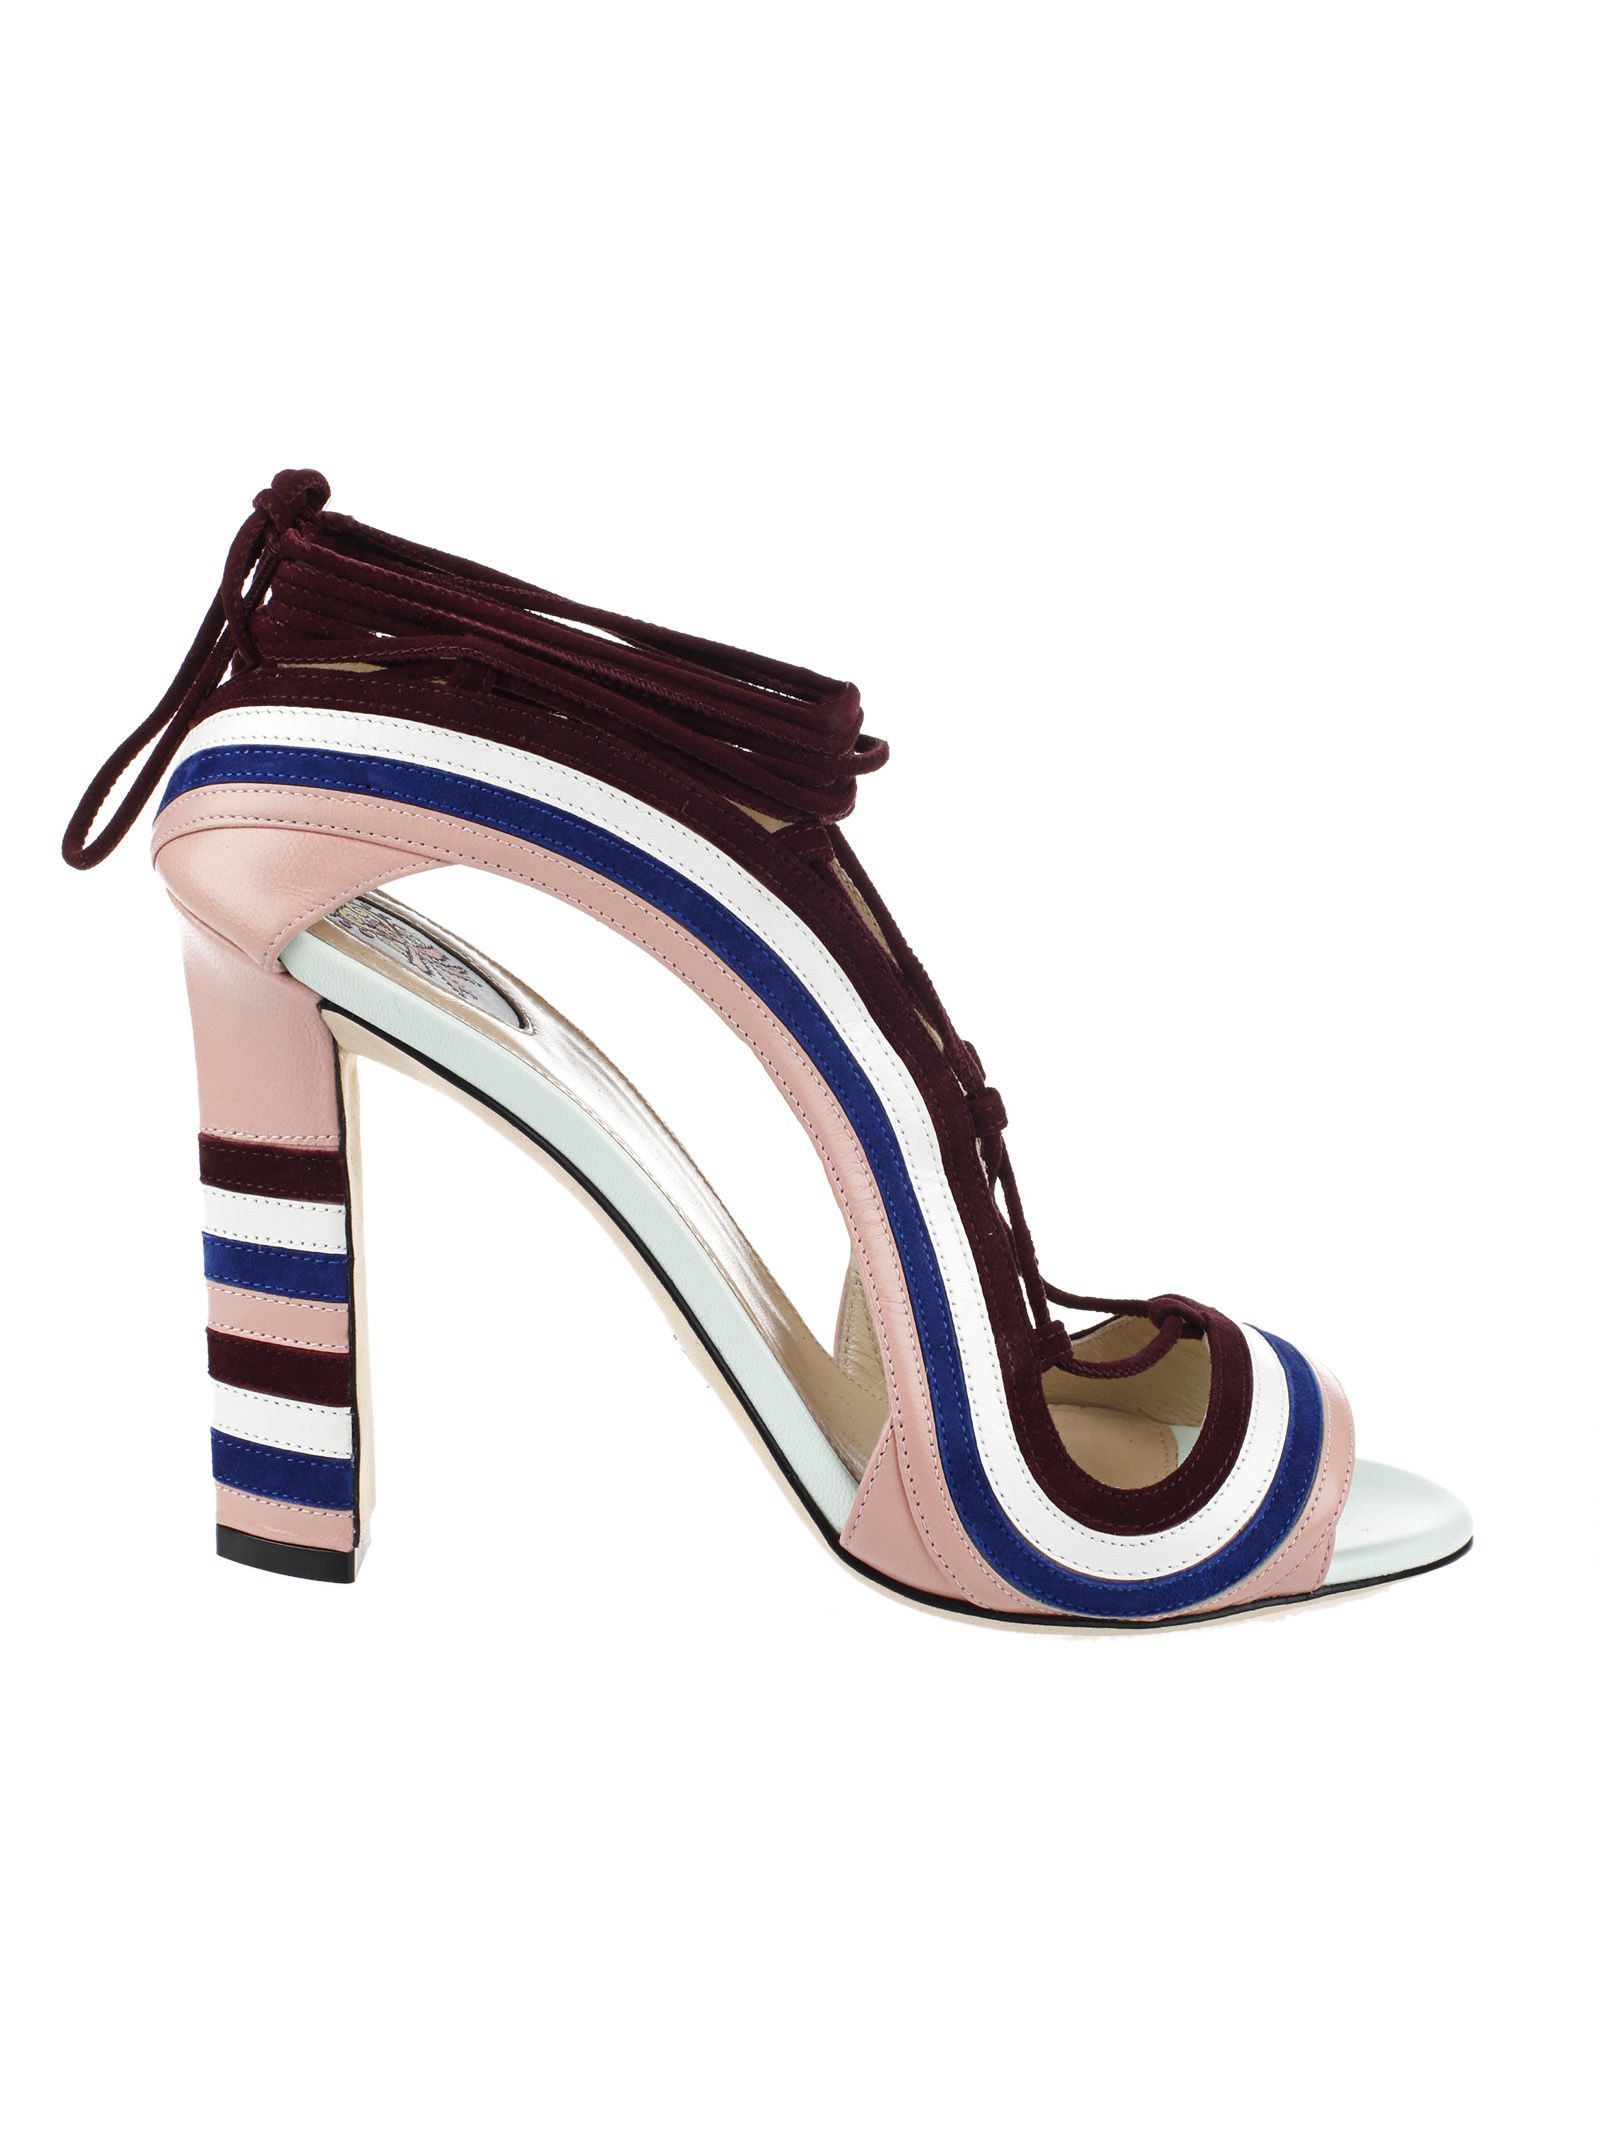 Paula Cademartori Crazy Stripes Sandal